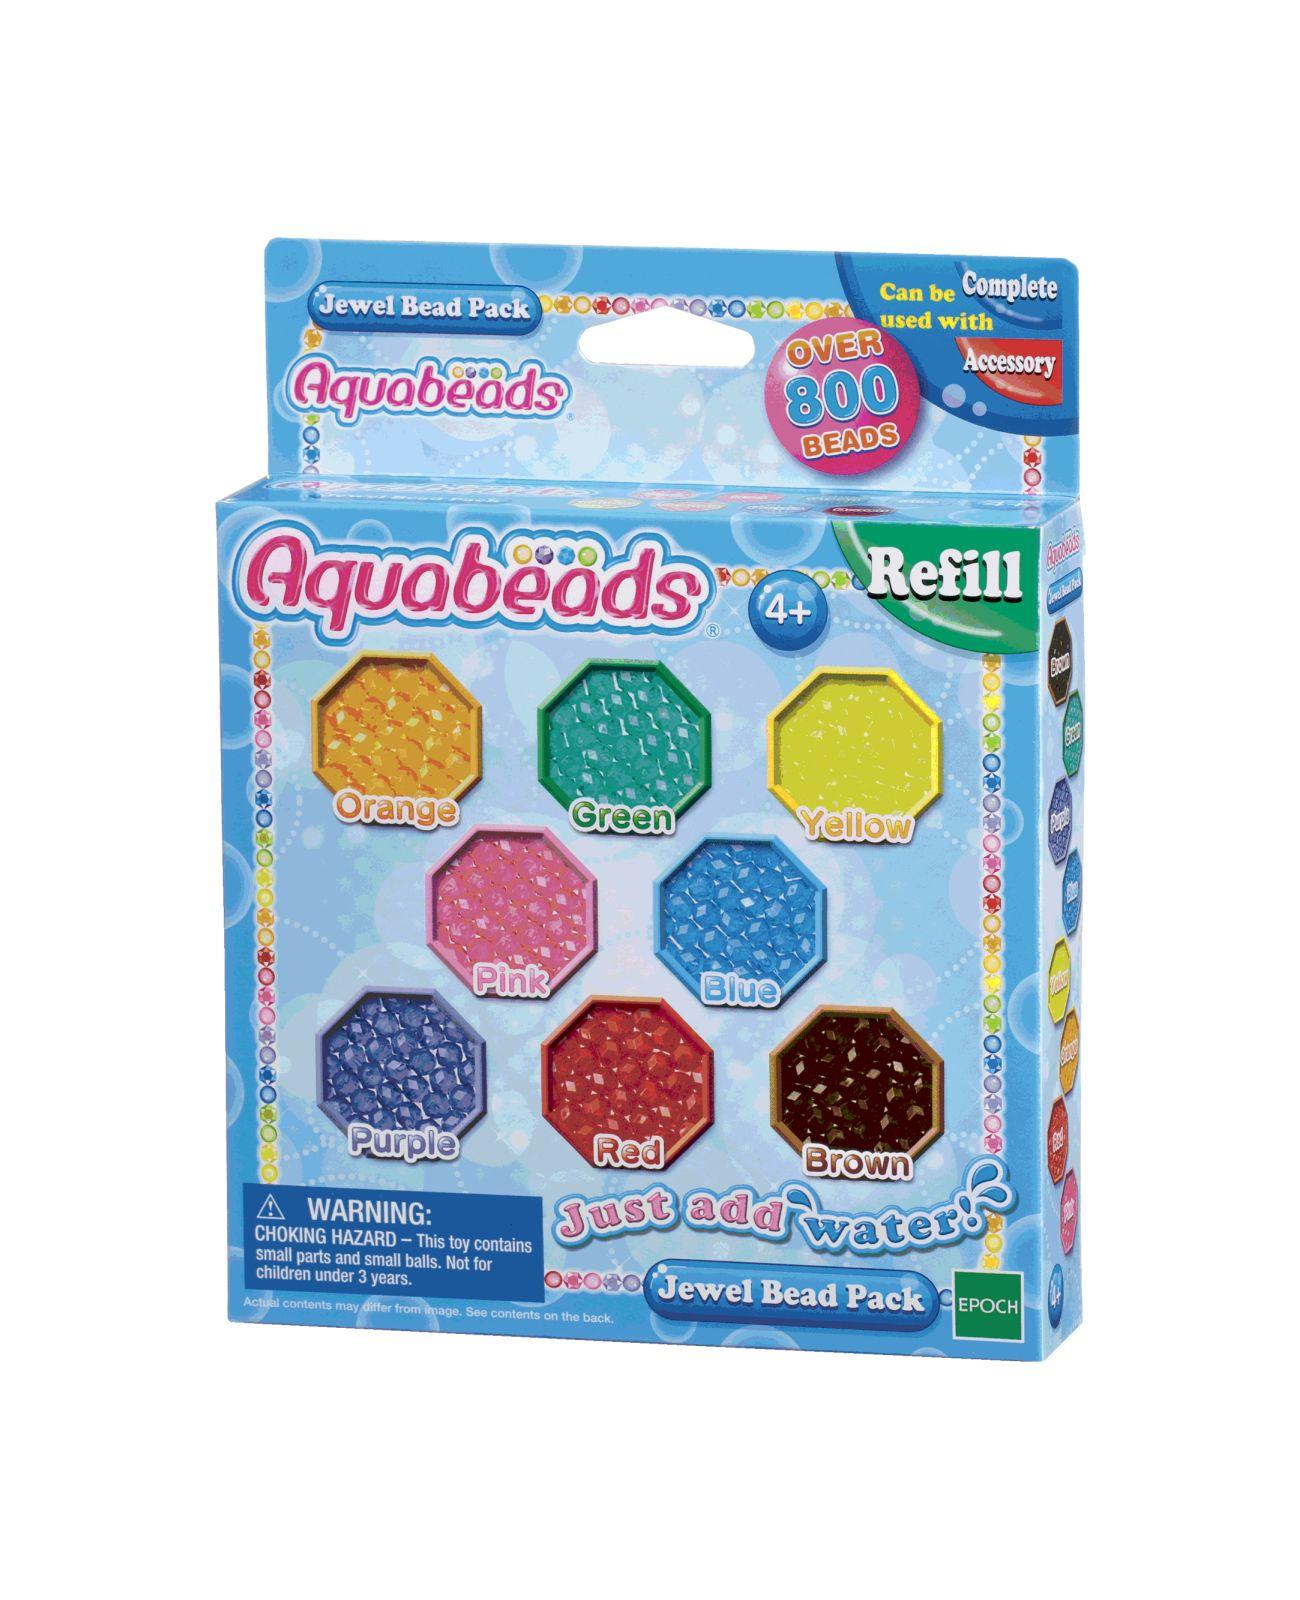 Aquabeads scat perline gioiello - AQUABEADS